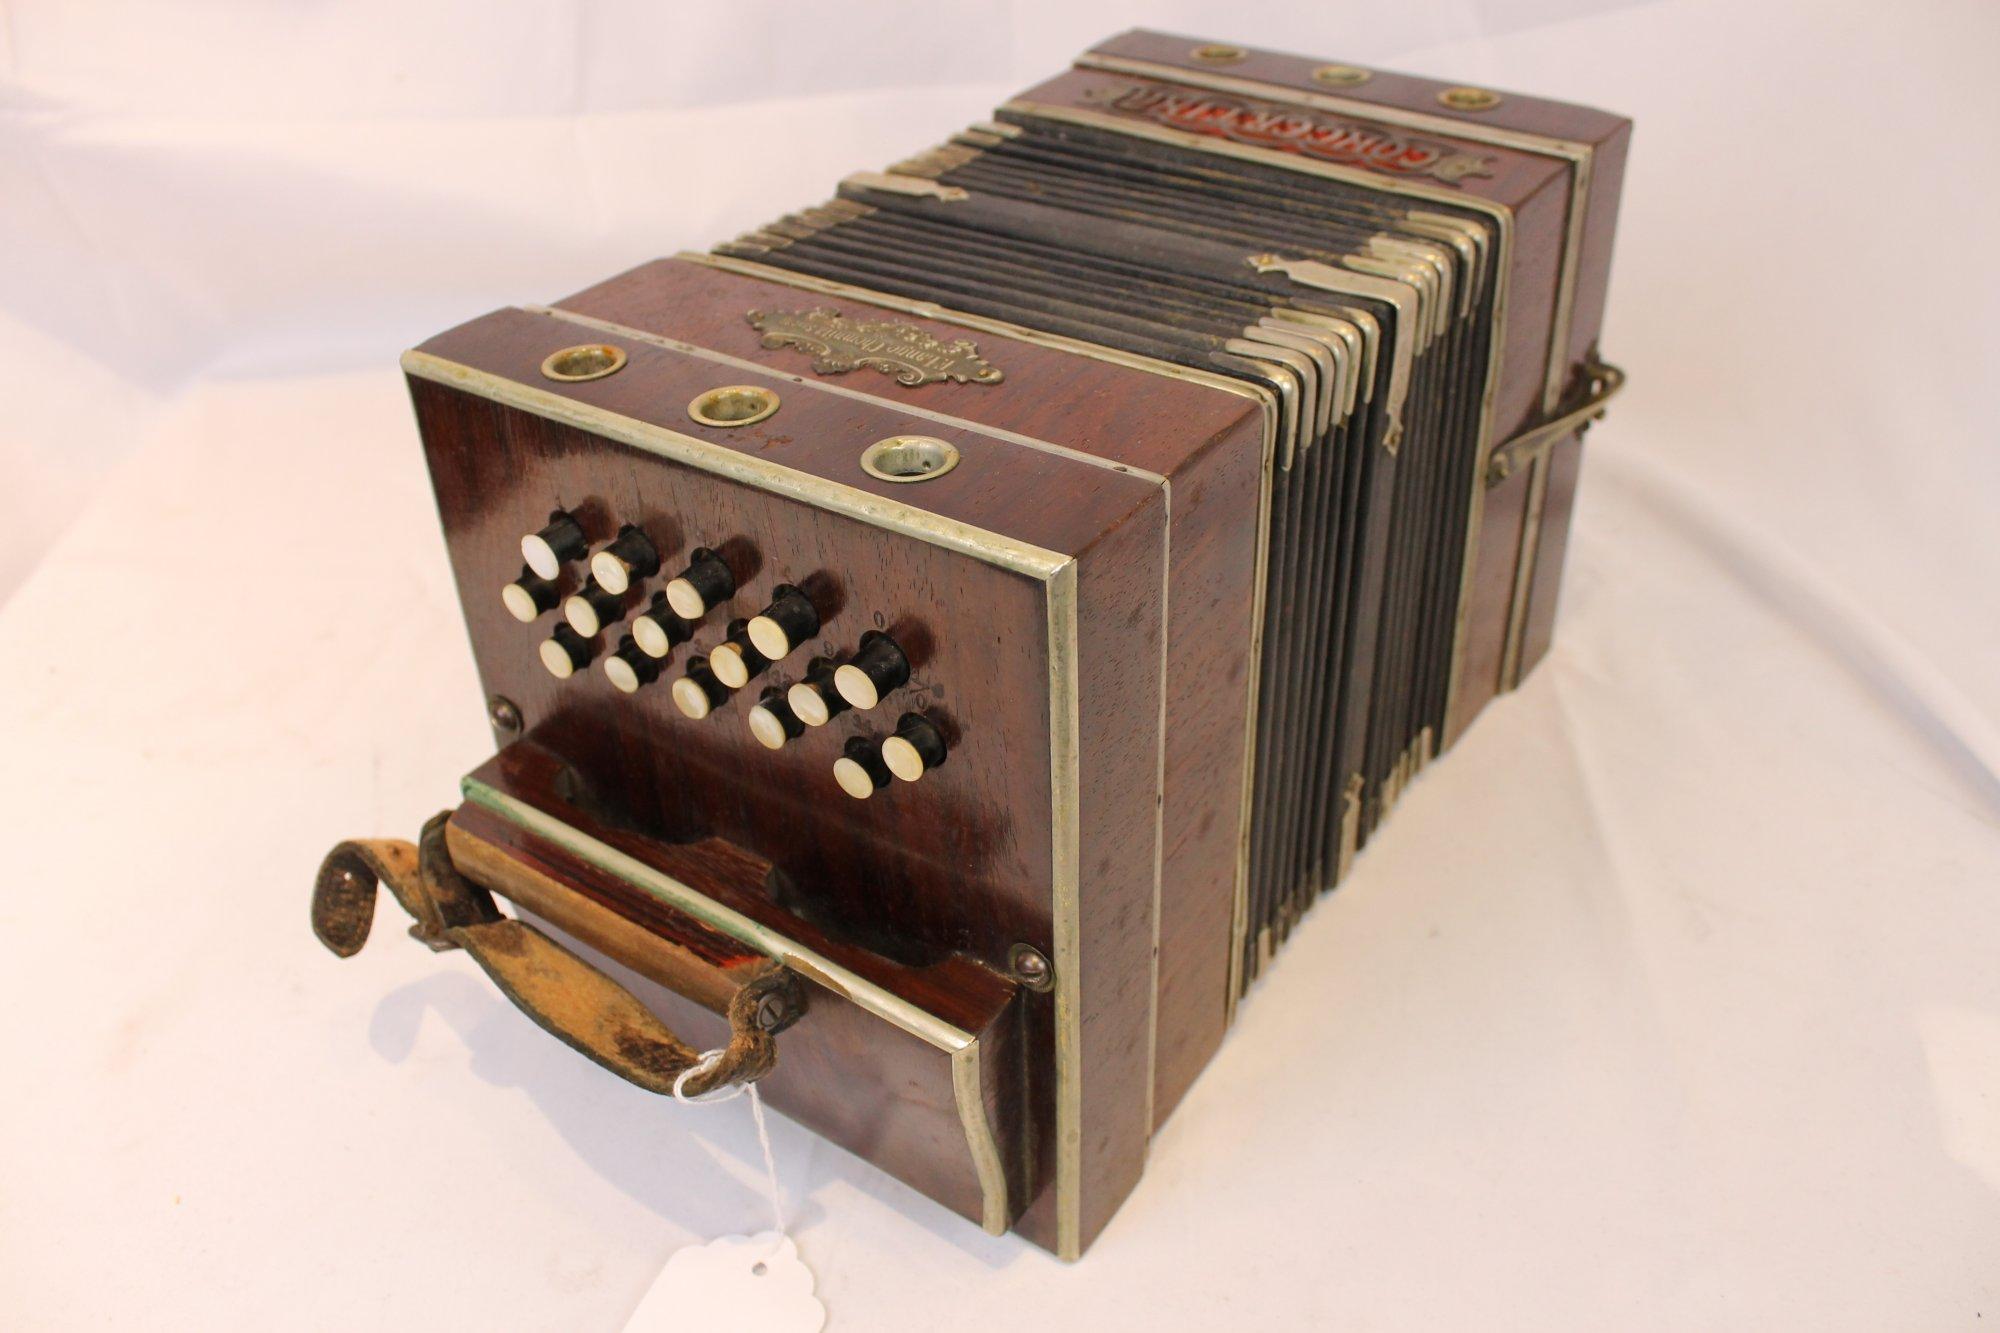 4145 - Wood Chemnitzer Concertina LM 22 16